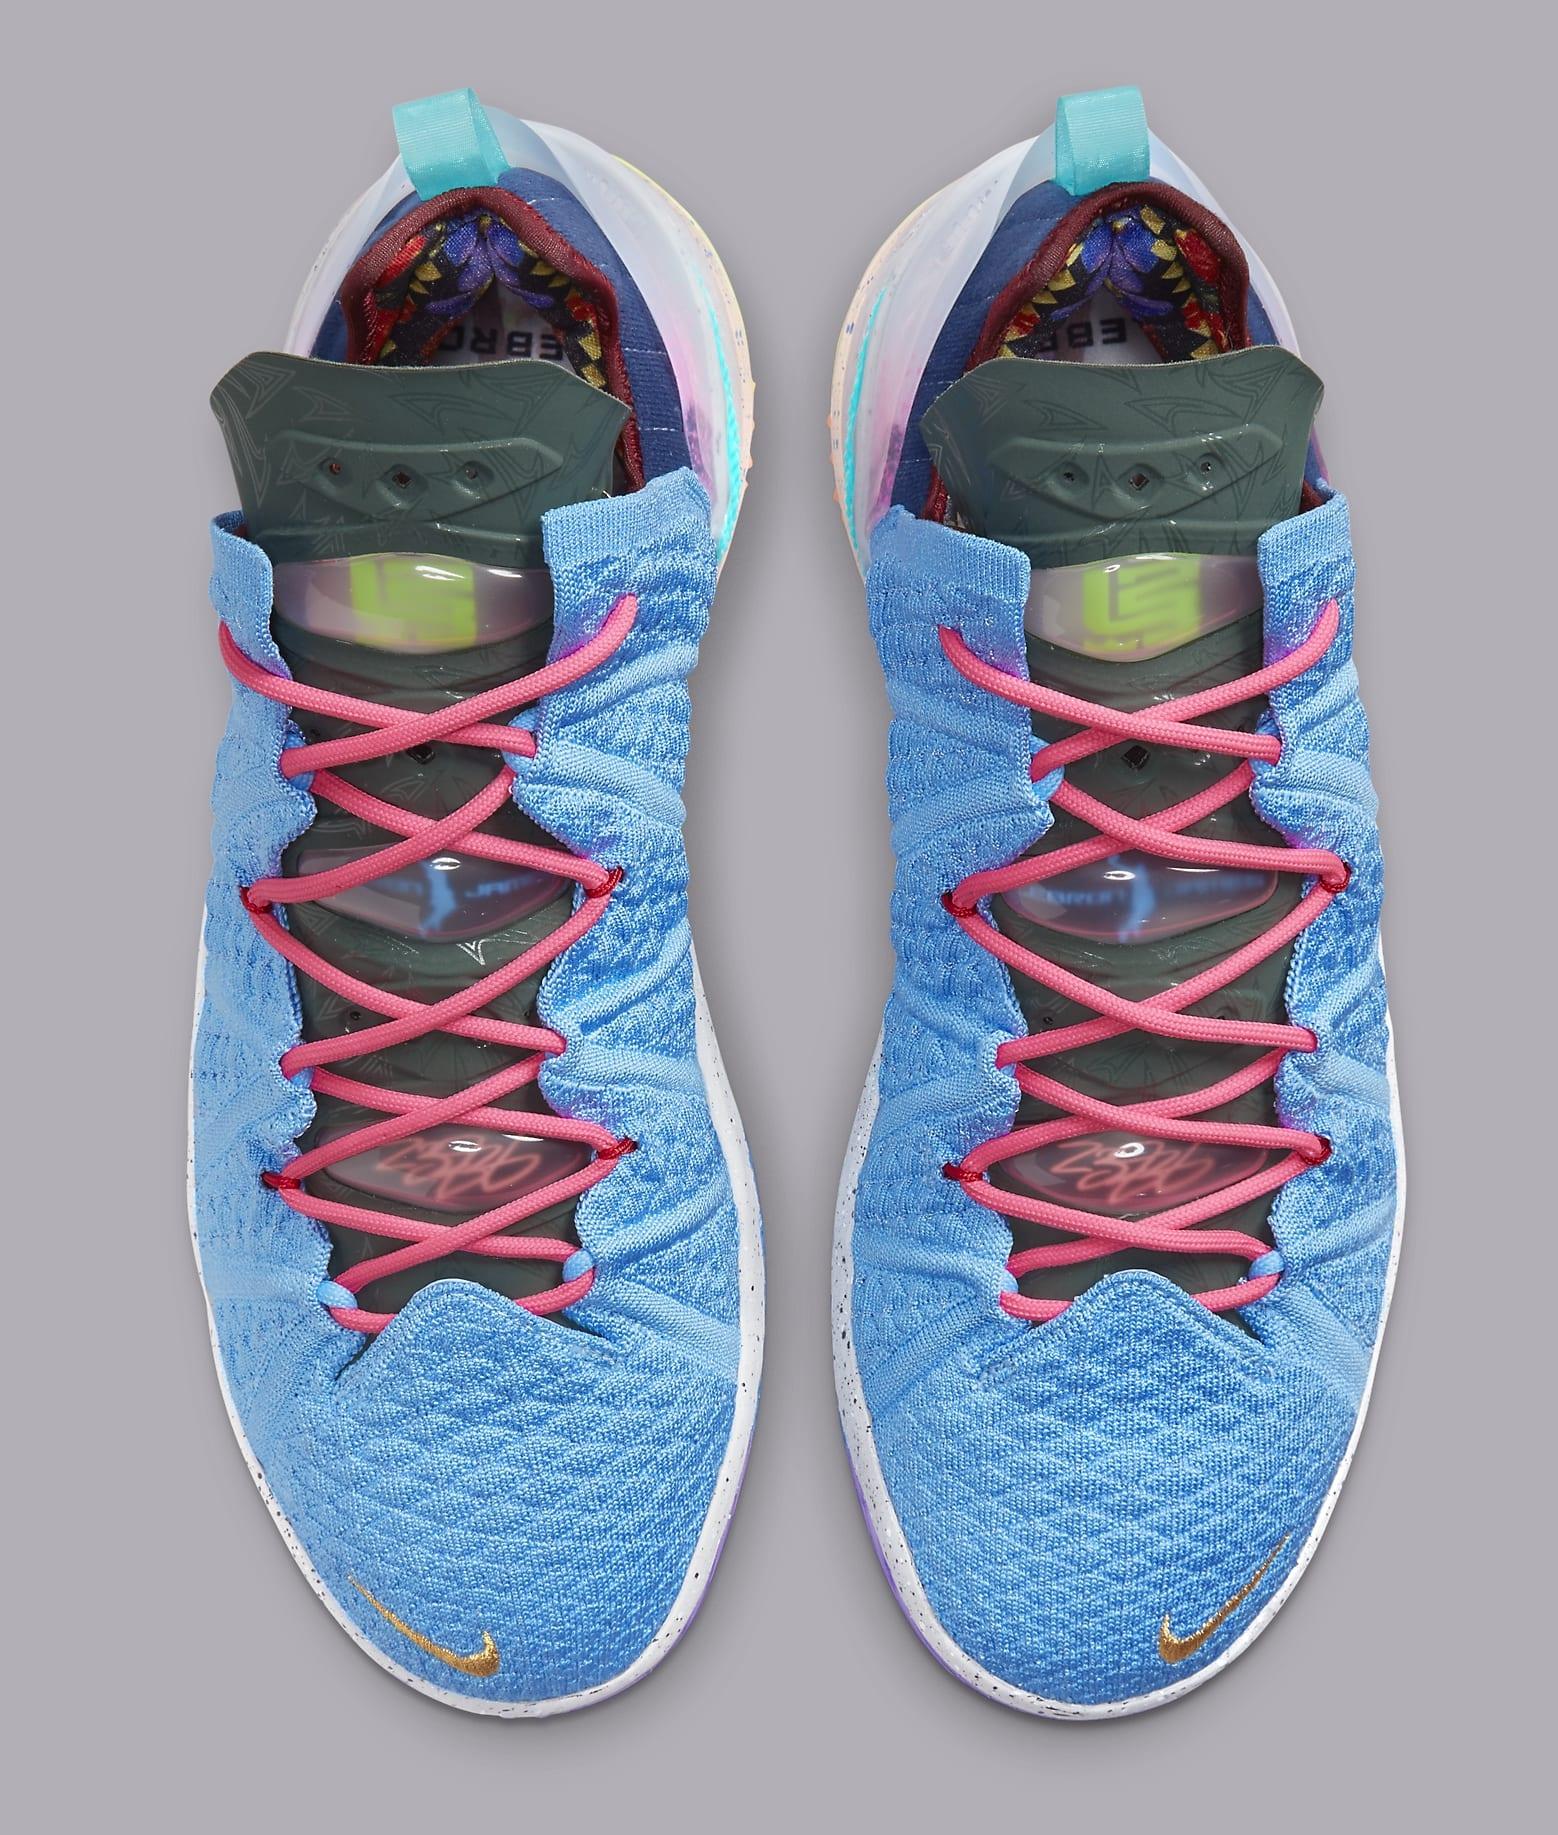 Nike LeBron 18 'Best 1-9' DM2813 400 Top